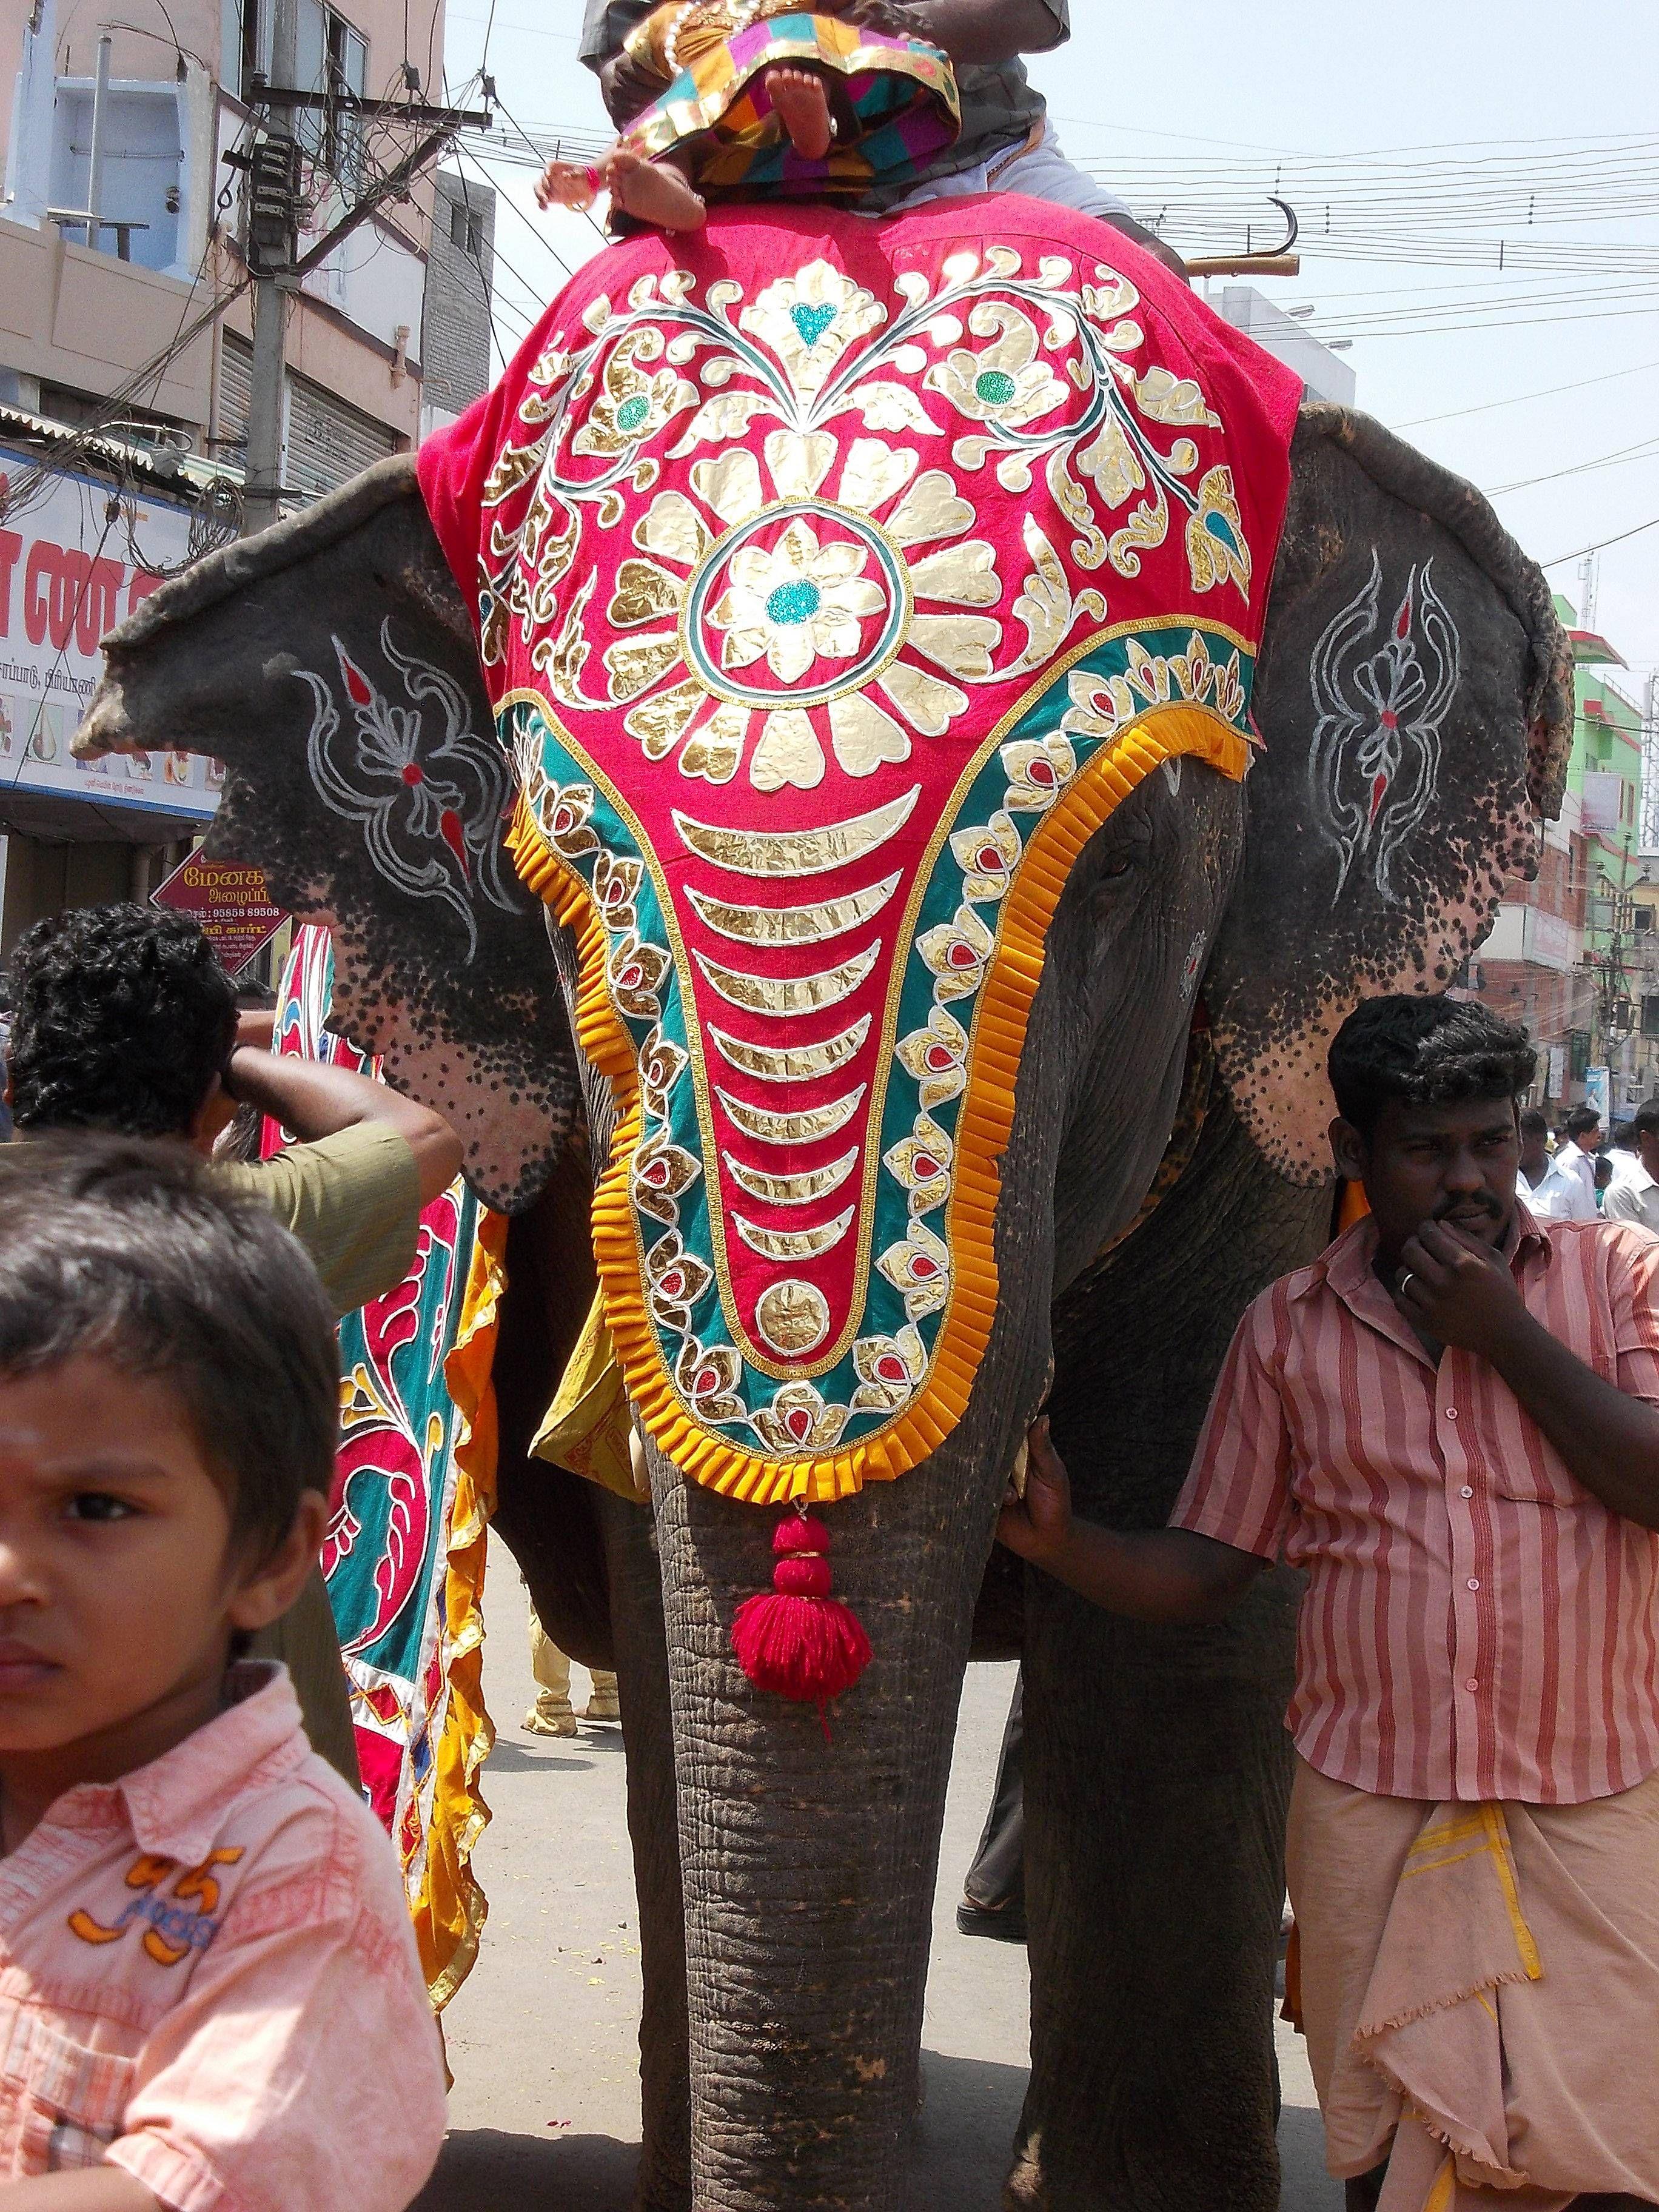 painted elephant Festival India. Three men accompanied the ...